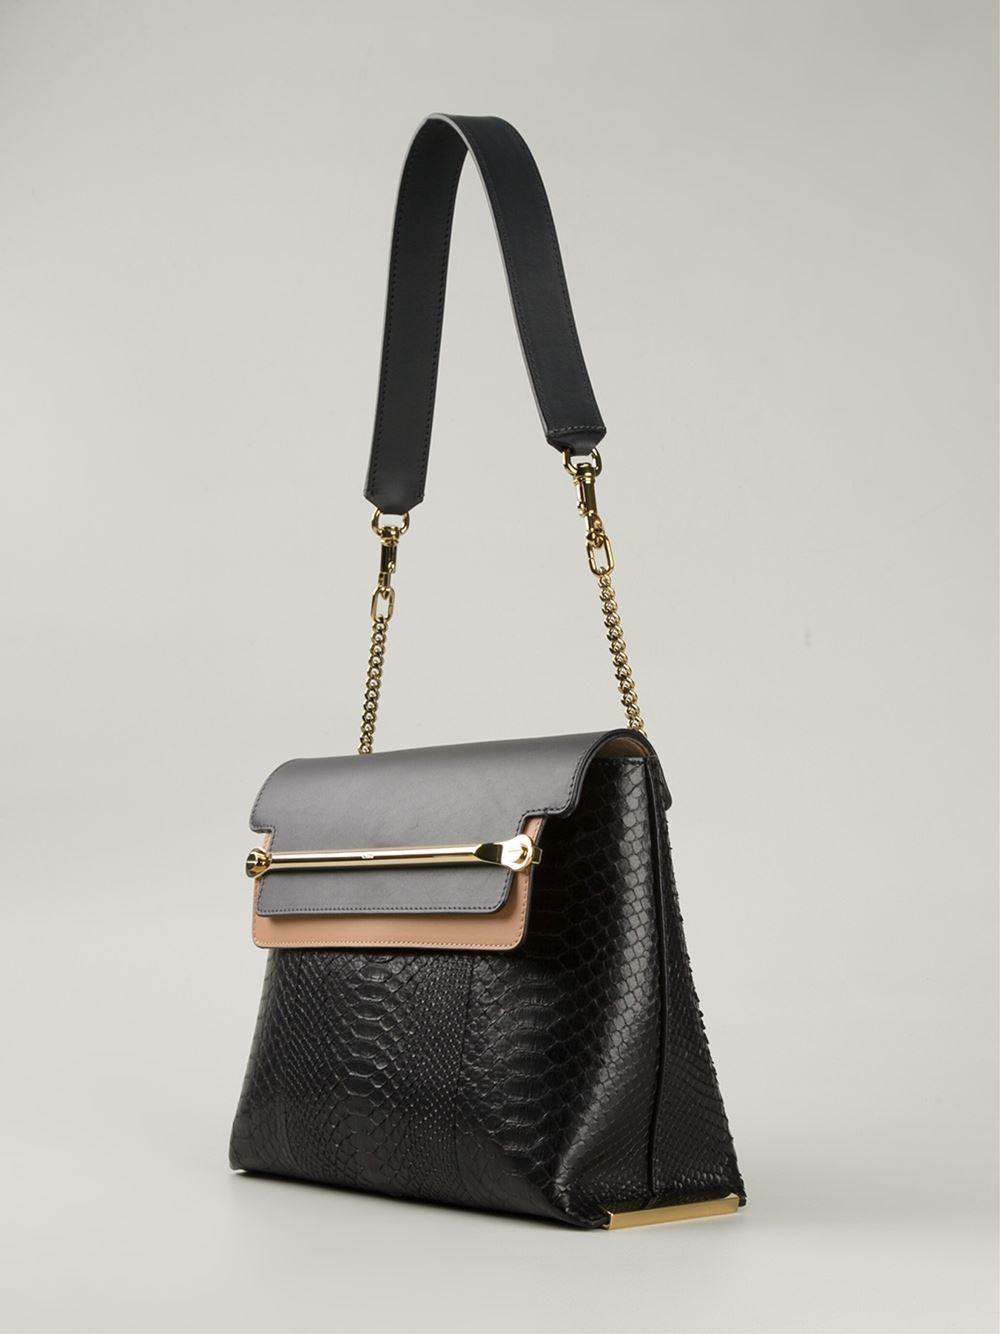 chloe marcie gray - Chlo�� Clare Python-Skin Shoulder Bag in Black | Lyst